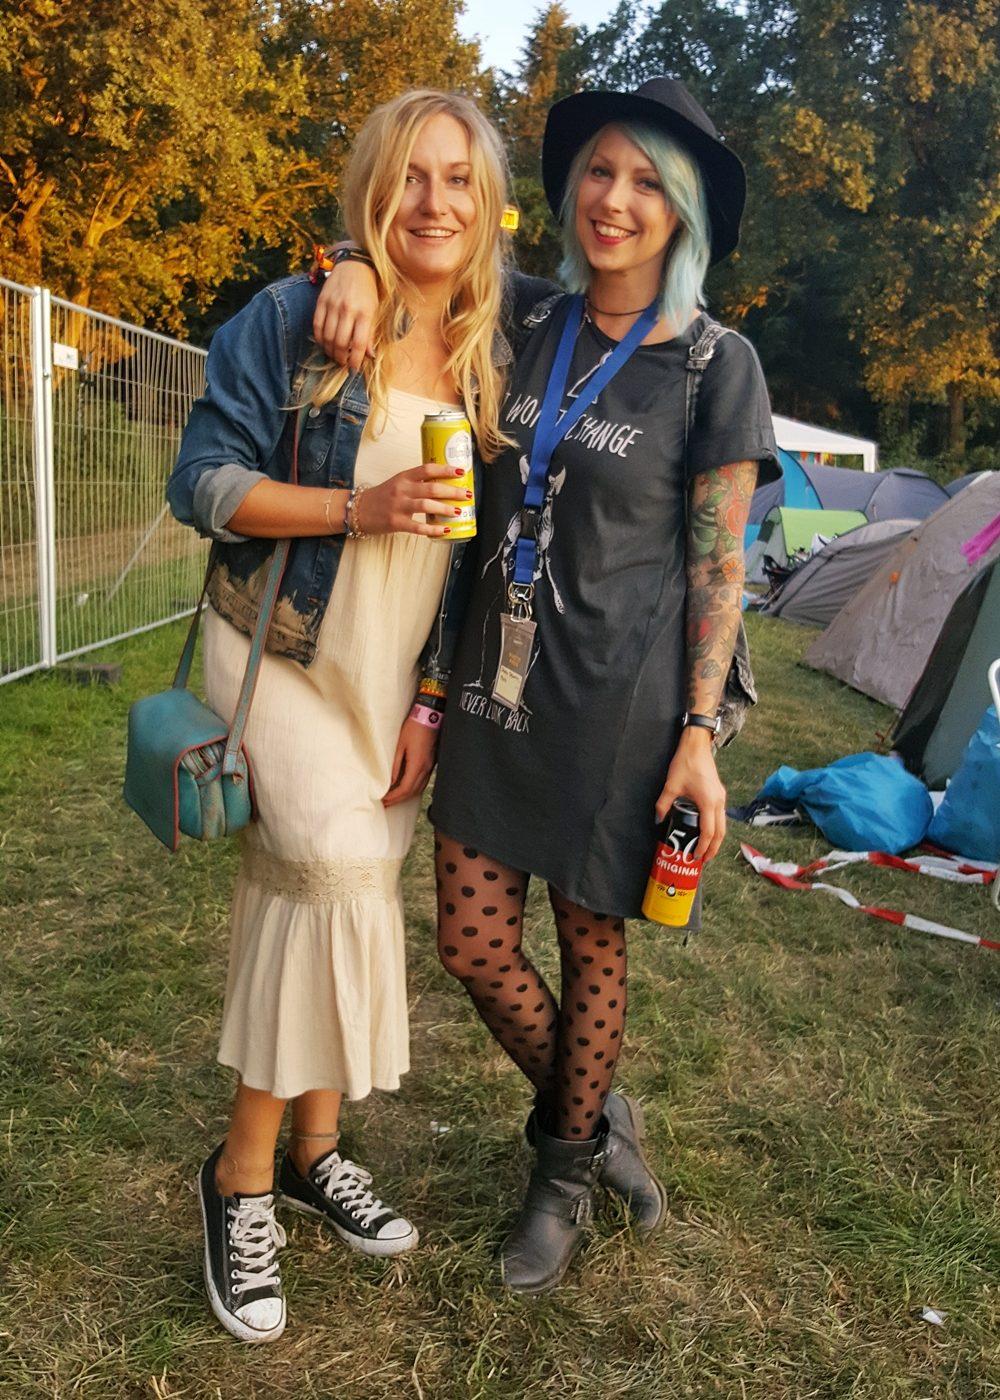 Parookaville Festival 2016 Weeze Electro Festivalblogger (8)